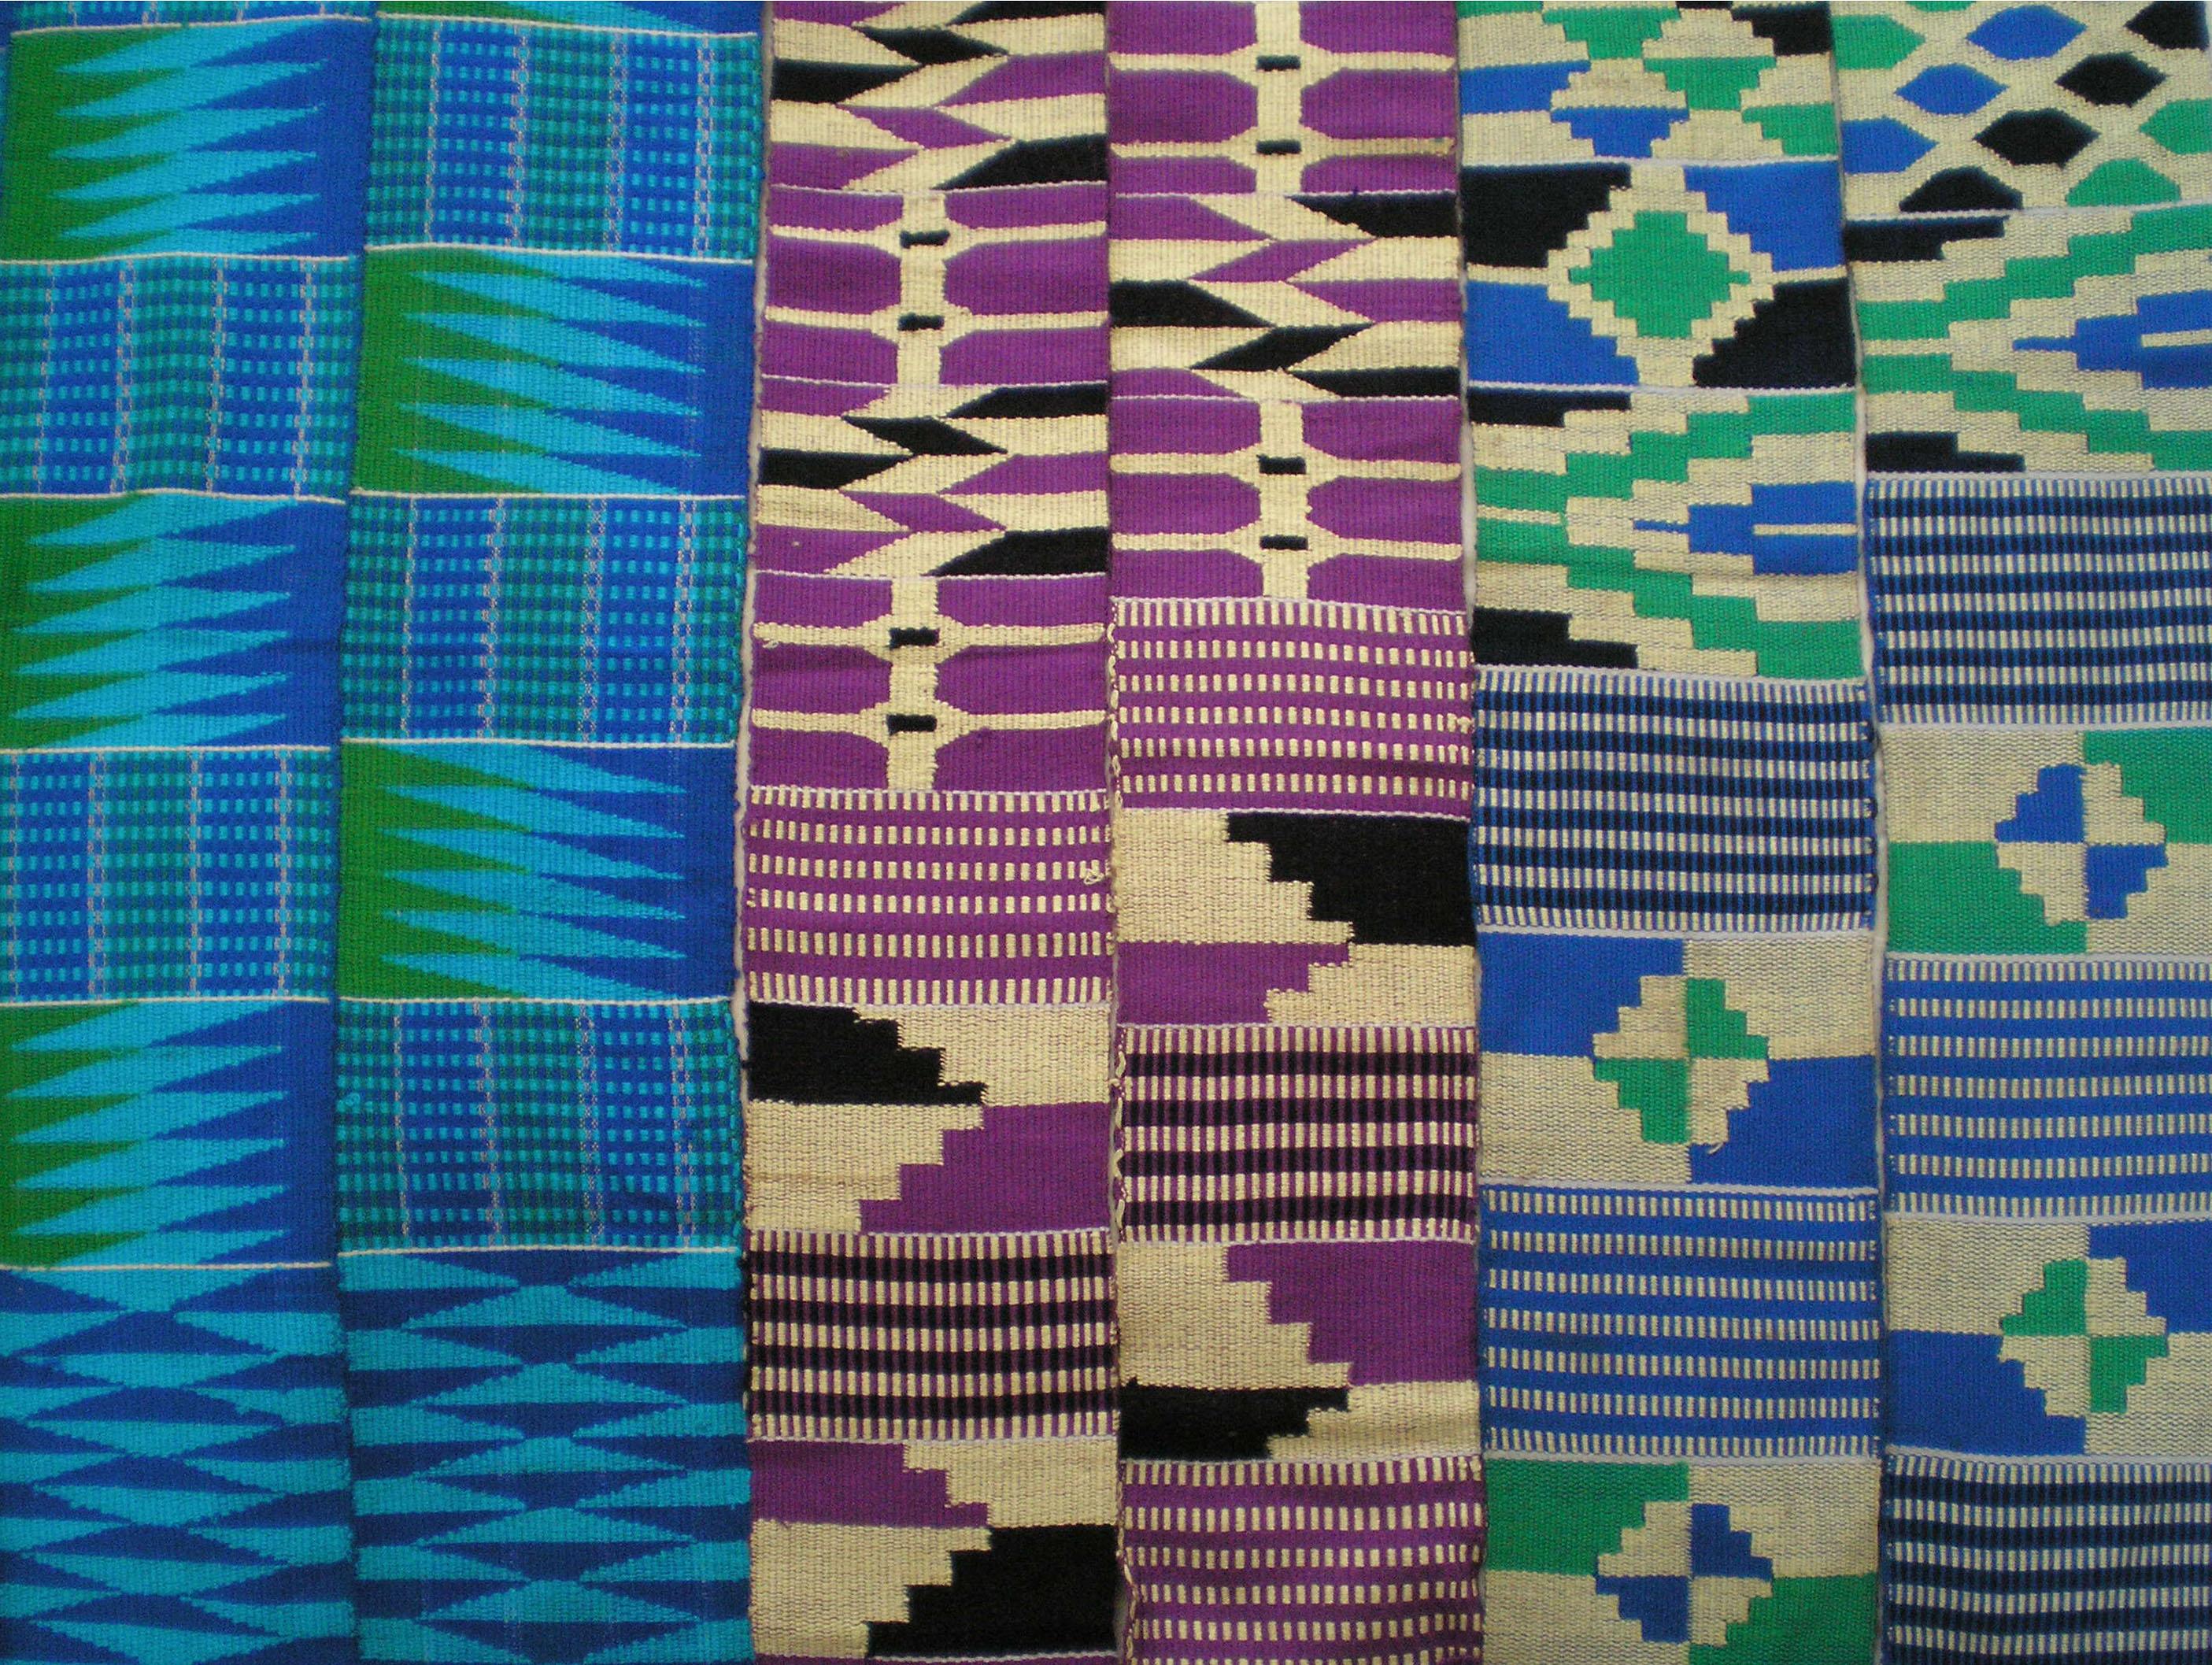 Ewe_kente_stripes,_Ghana.jpg